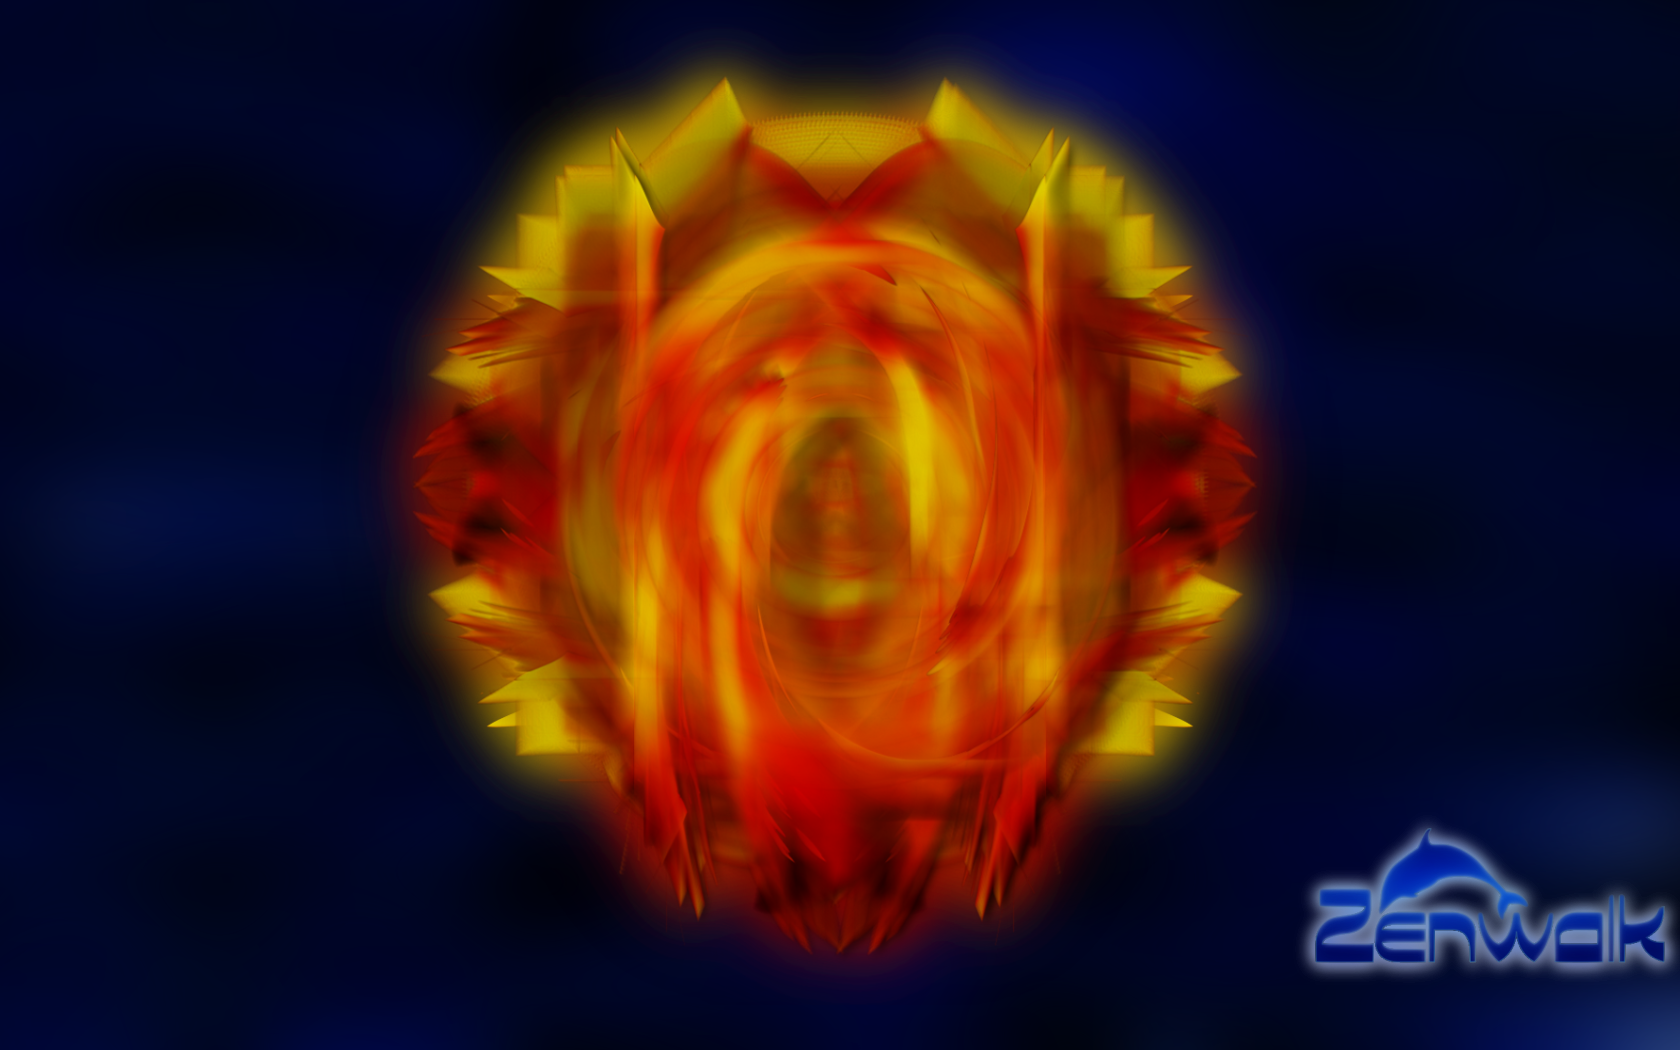 Zenwalk Flaming Feathers by Zwopper